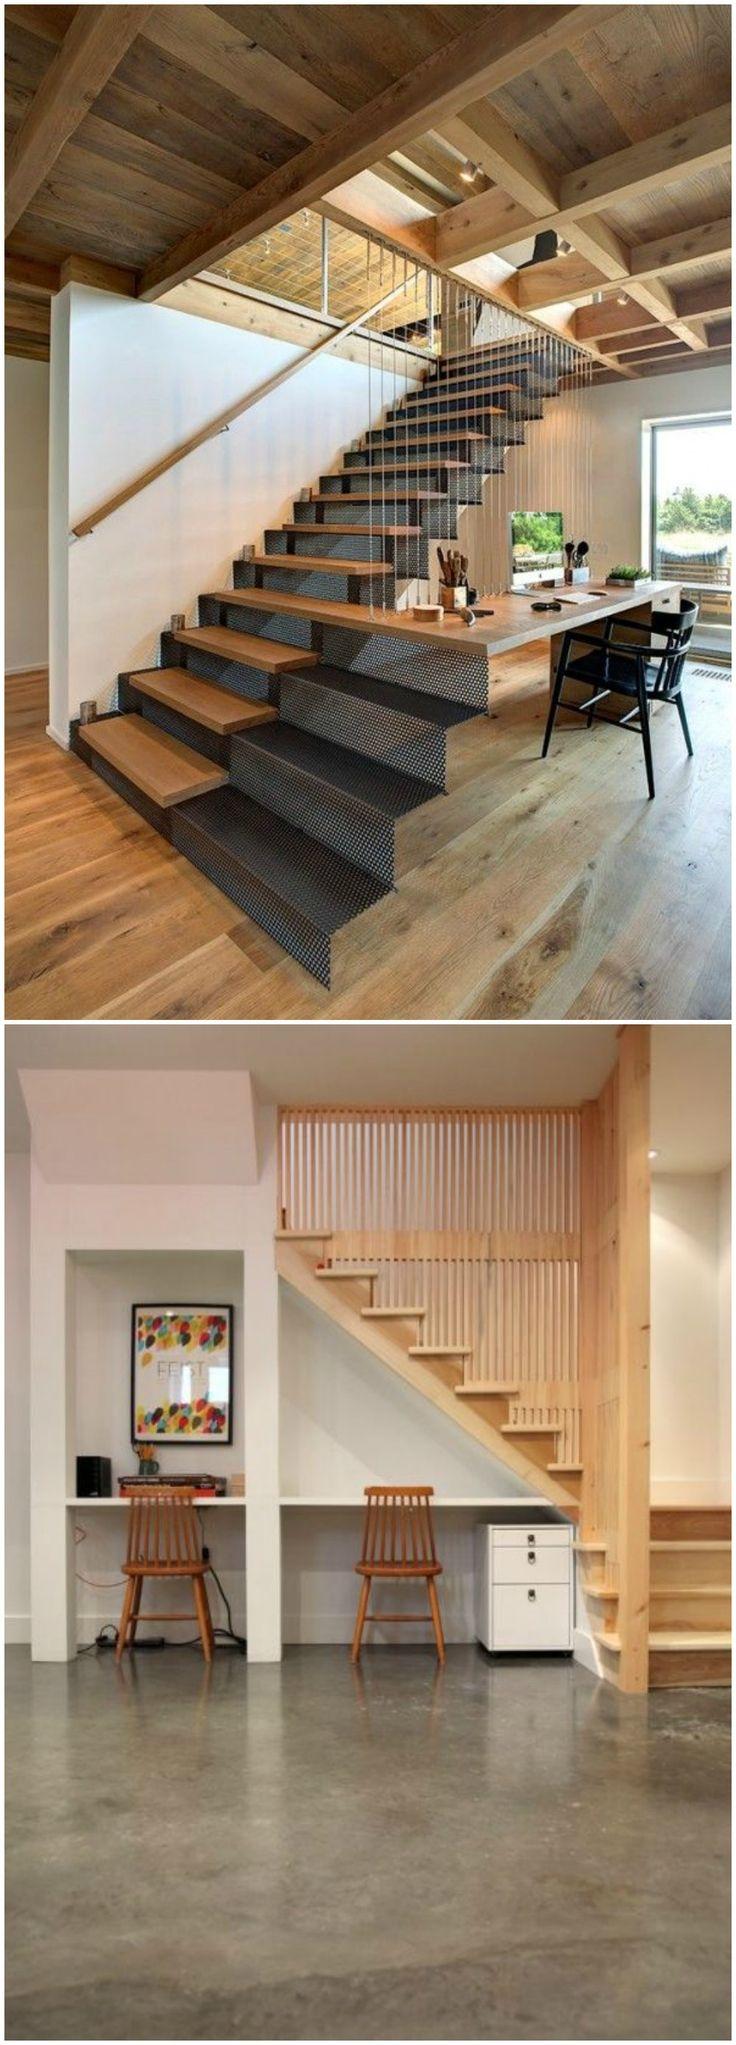 Las 25 mejores ideas sobre entrepiso en pinterest for Escaleras metalicas para casa